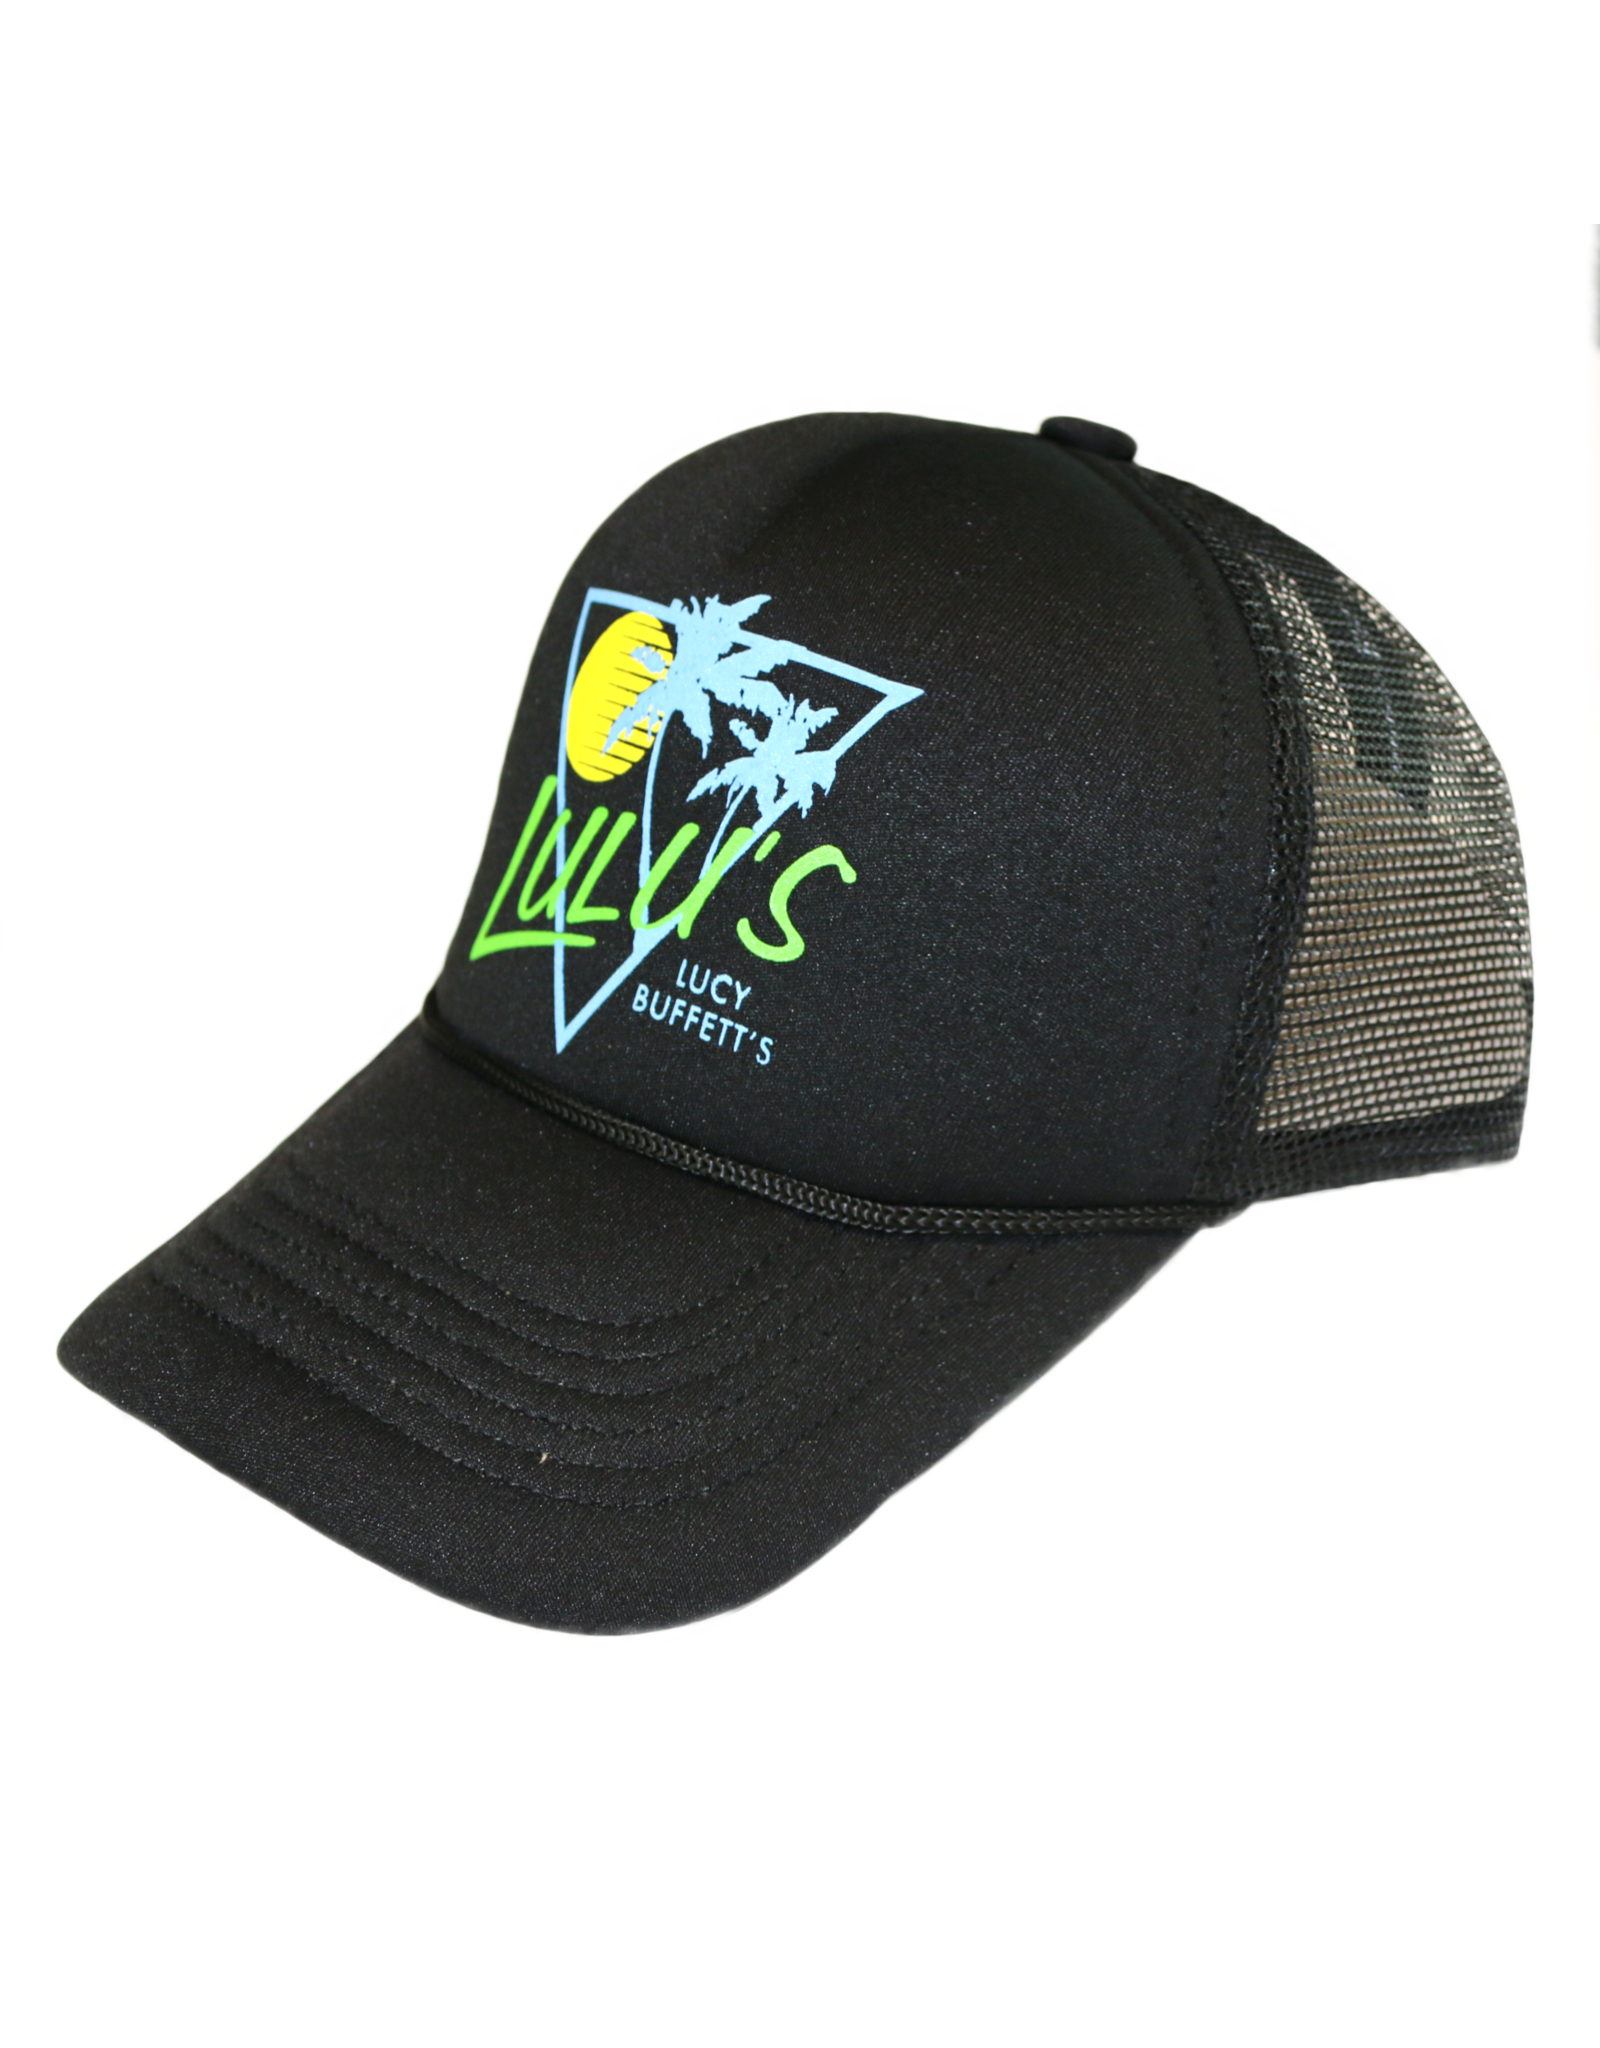 Rising Sun Braided Trucker Hat